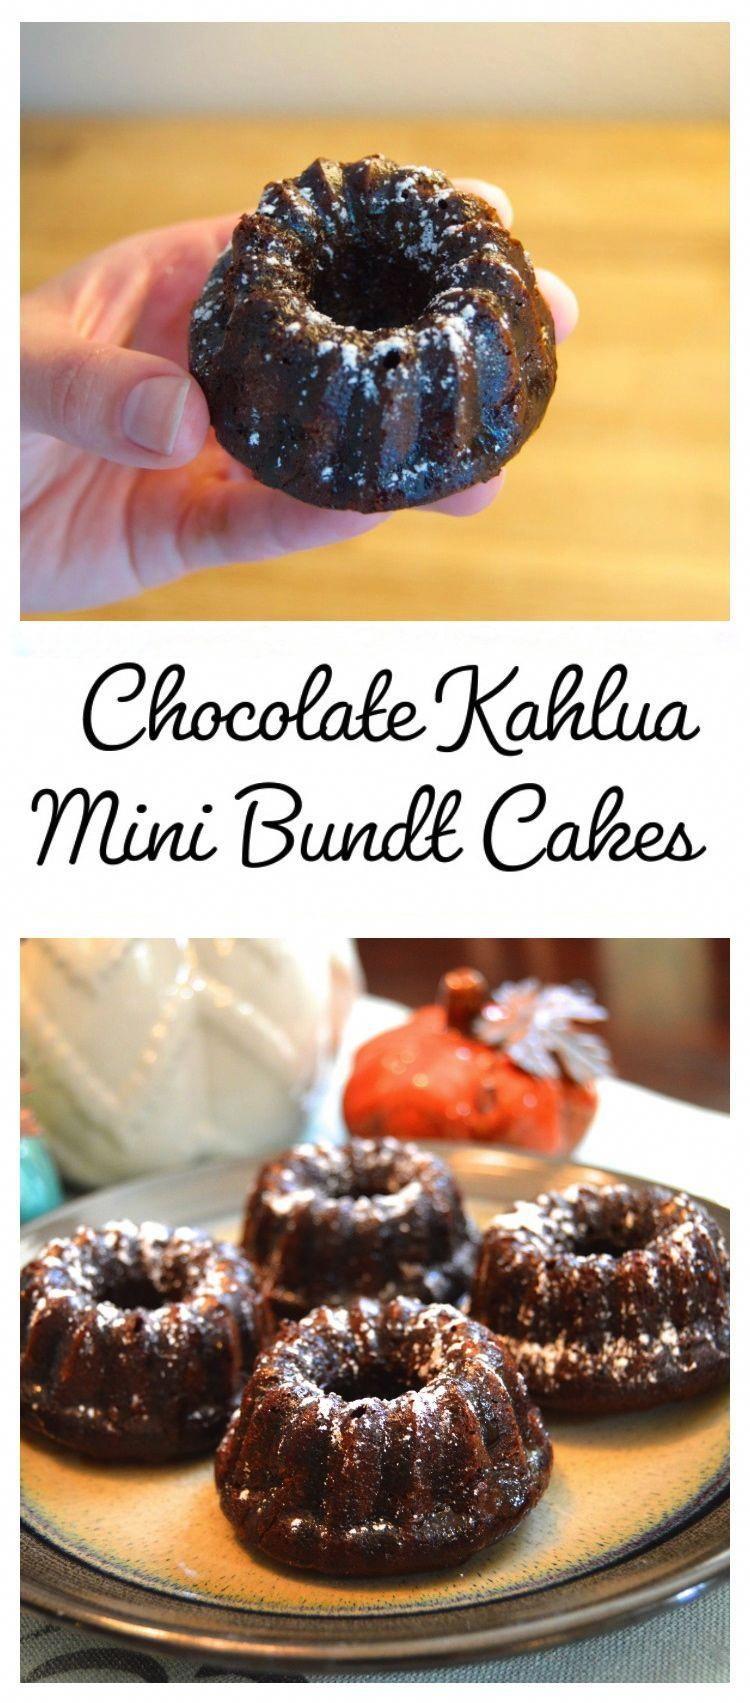 Chocolate kahlua mini bundt cake recipe in a nutshell